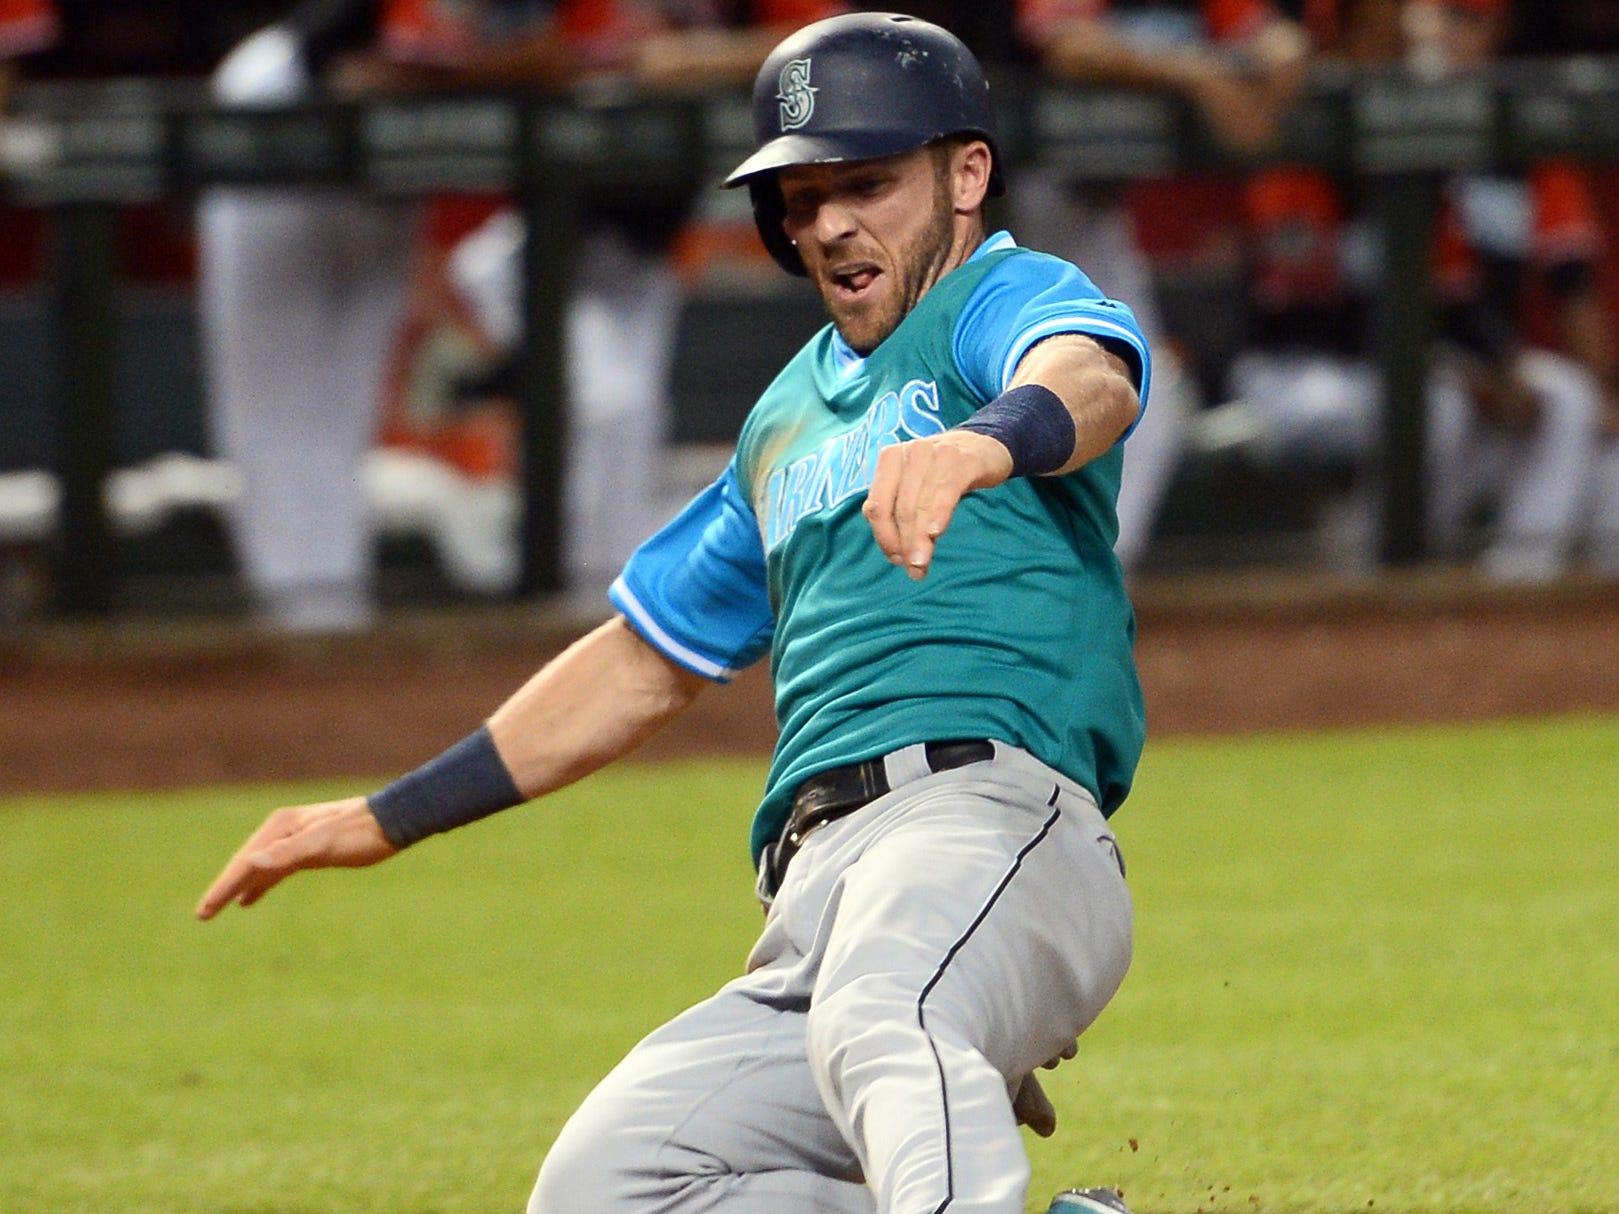 Aug 25, 2018; Phoenix, AZ, USA; Seattle Mariners shortstop Andrew Romine (7) scores a run against the Arizona Diamondbacks during the ninth inning at Chase Field. Mandatory Credit: Joe Camporeale-USA TODAY Sports